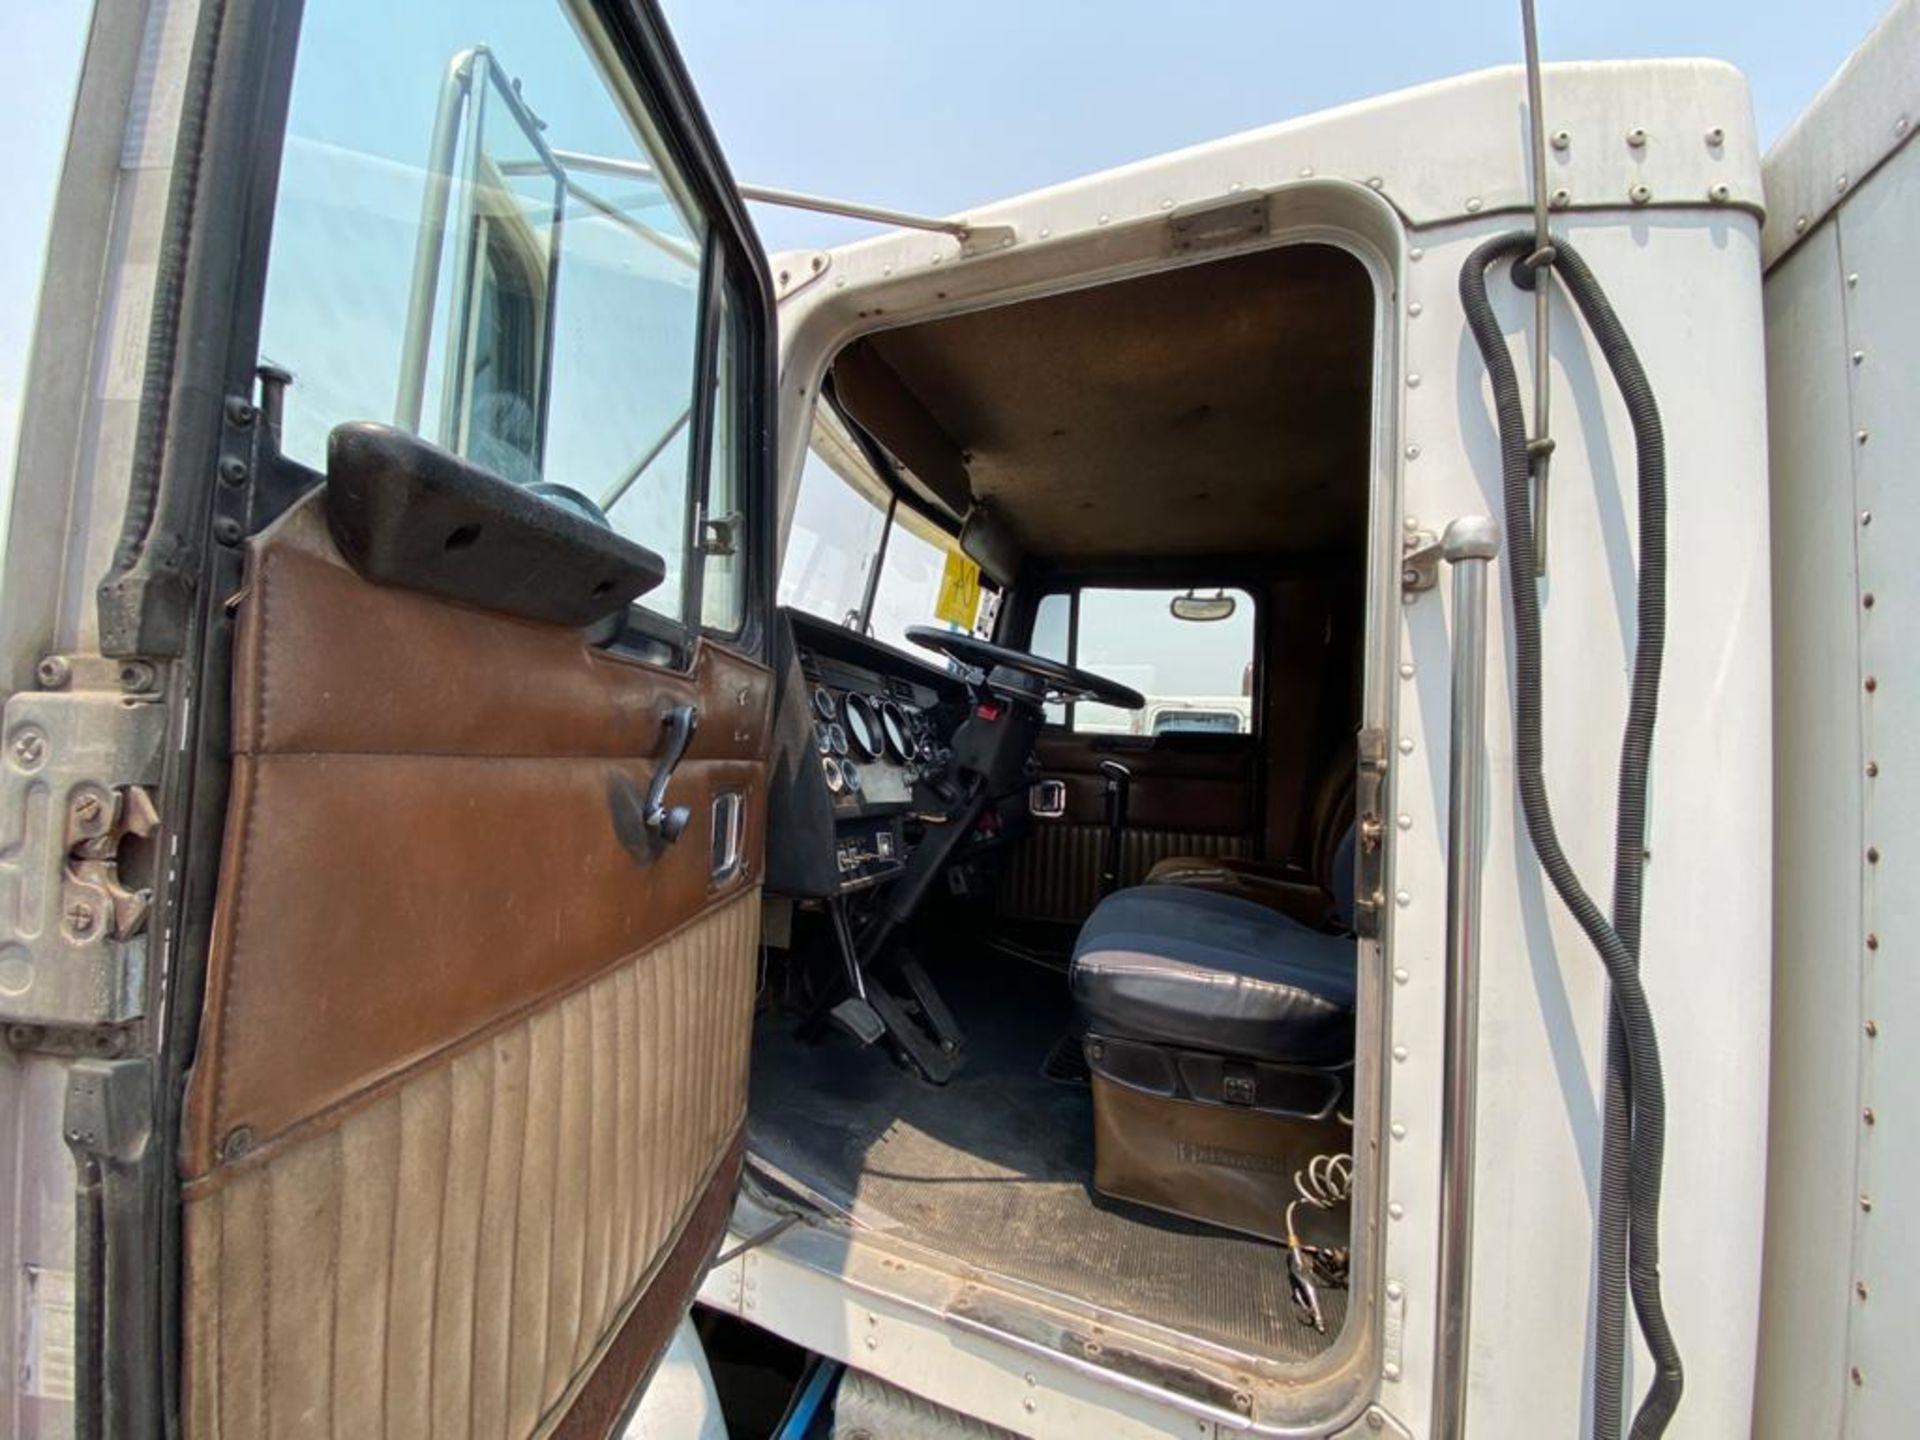 1999 Kenworth Sleeper truck tractor, standard transmission of 18 speeds - Image 48 of 70